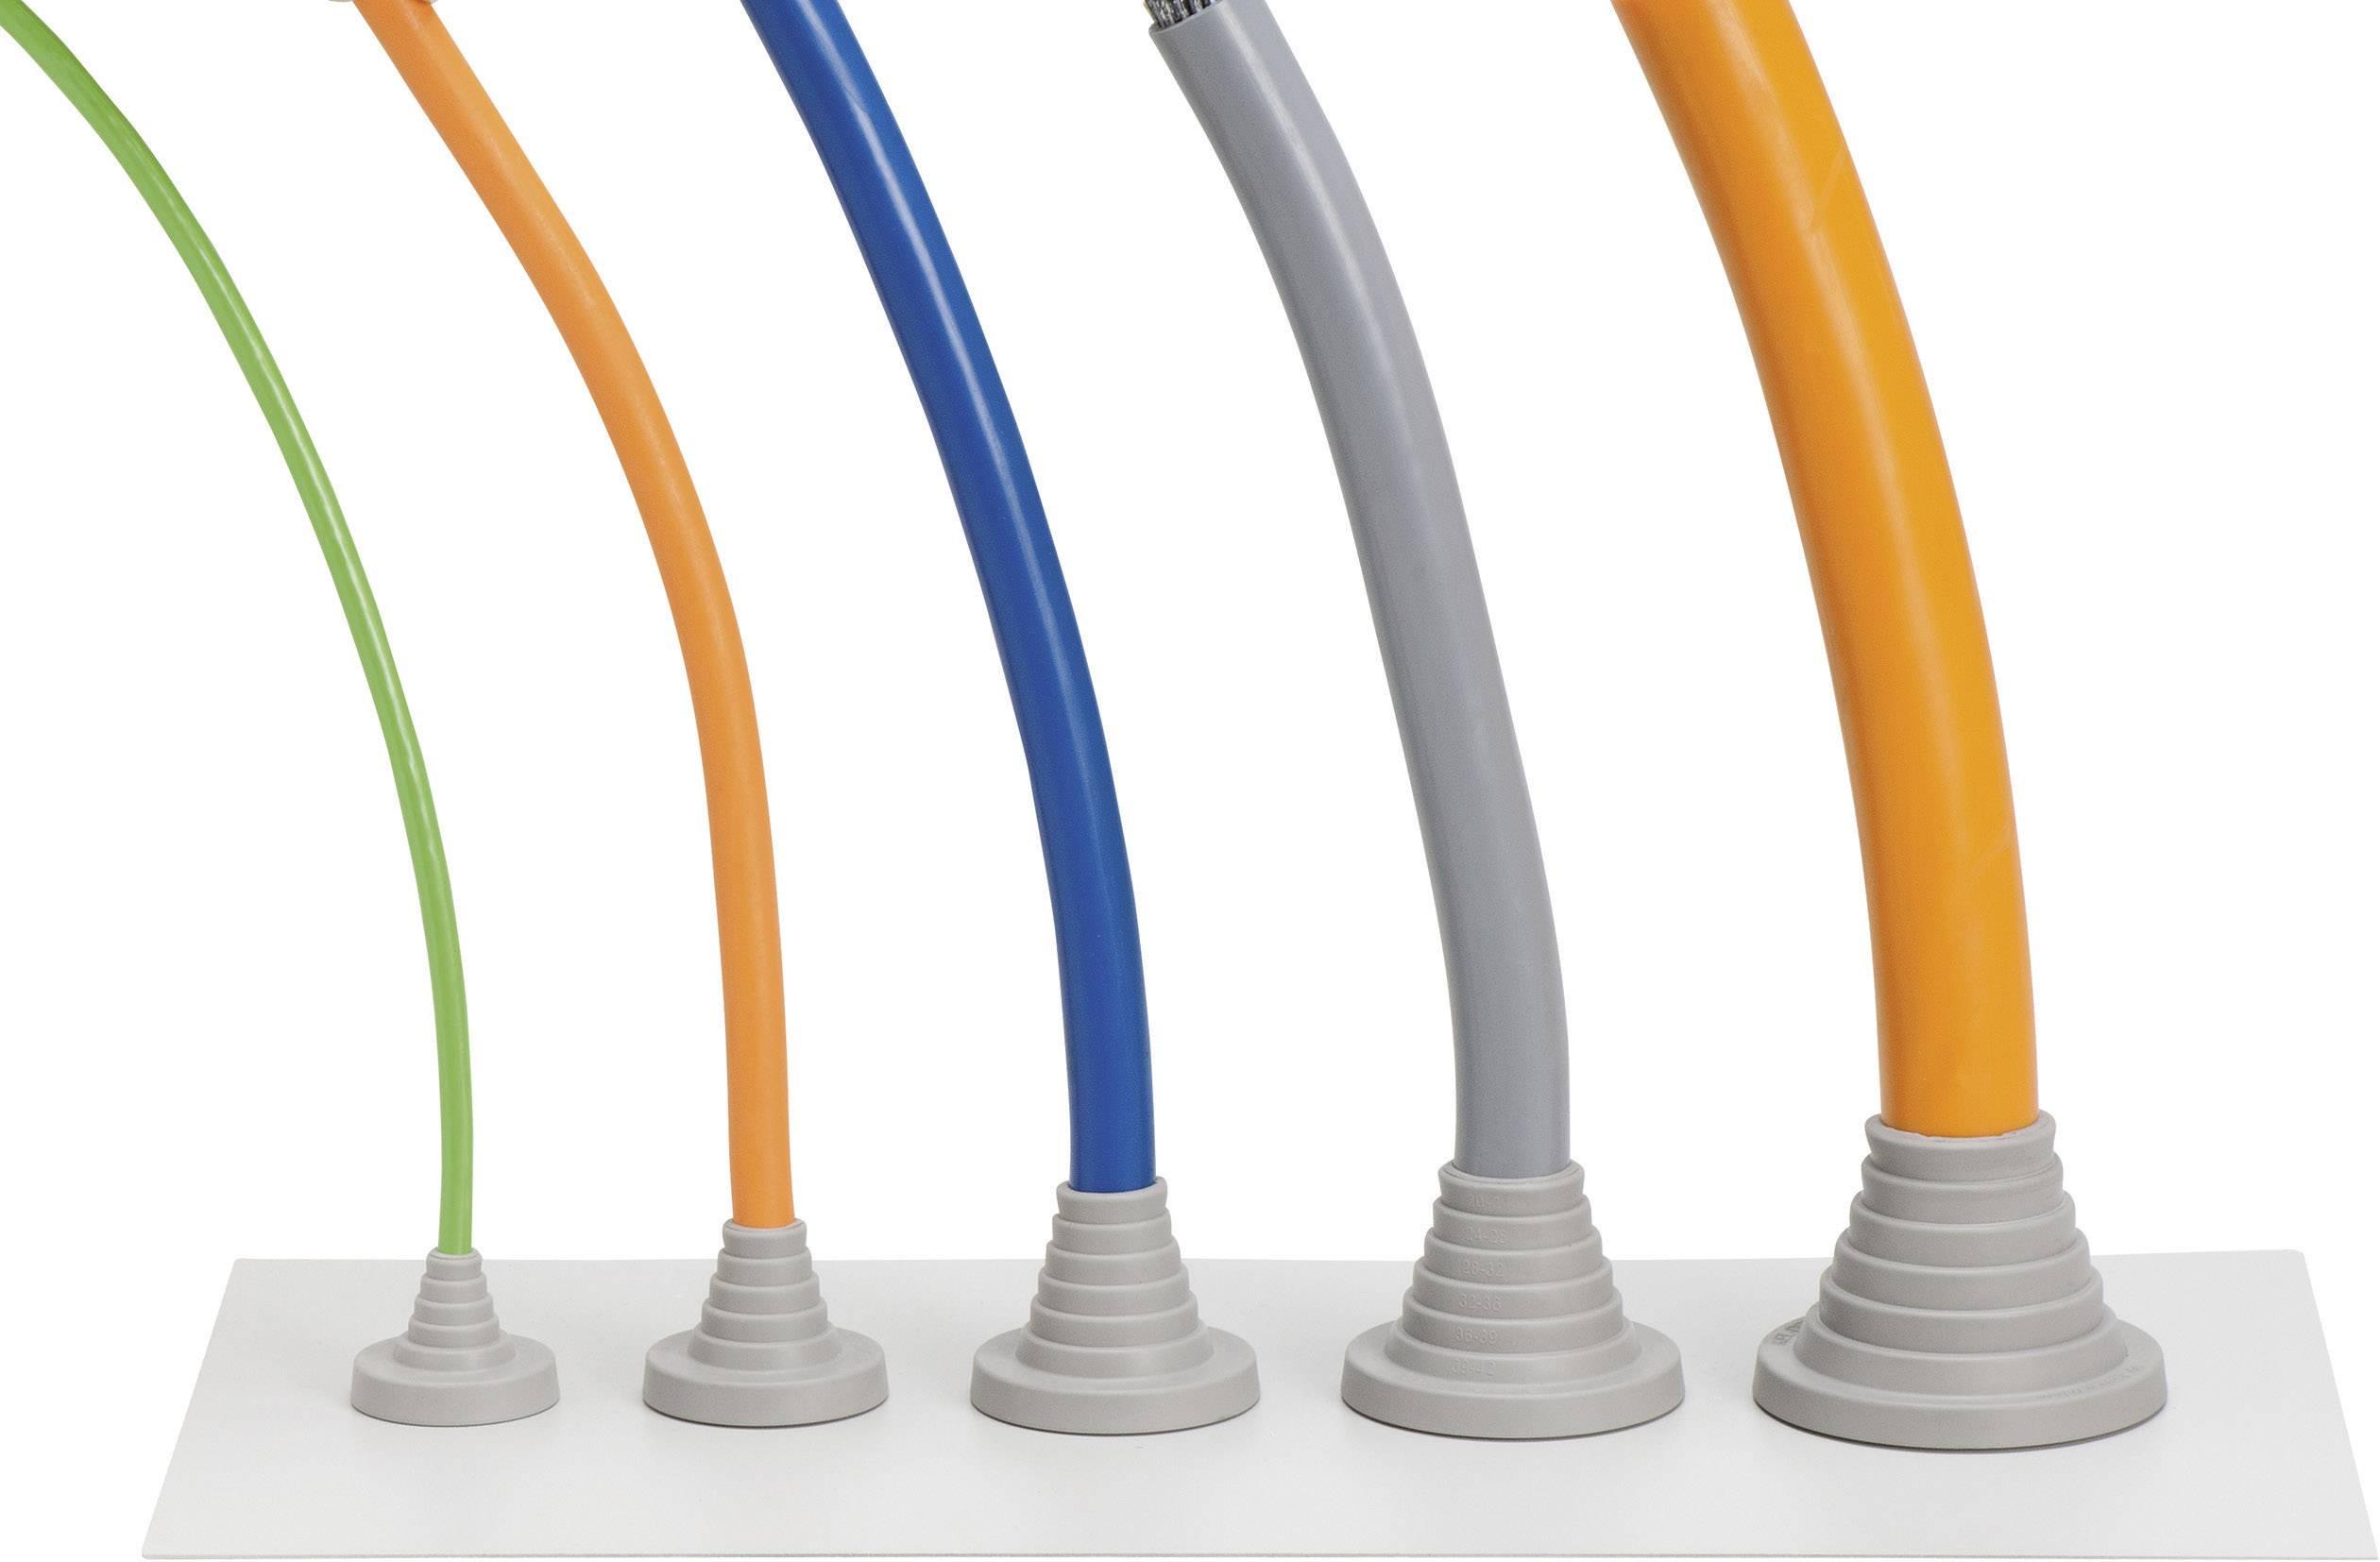 Icotek Uvodna kapa za kable KEL-DPF KEL-DPF 32/6-24 za kabel- 6 - 24 mm, velikost: M32 poliamid/elastomer, siva